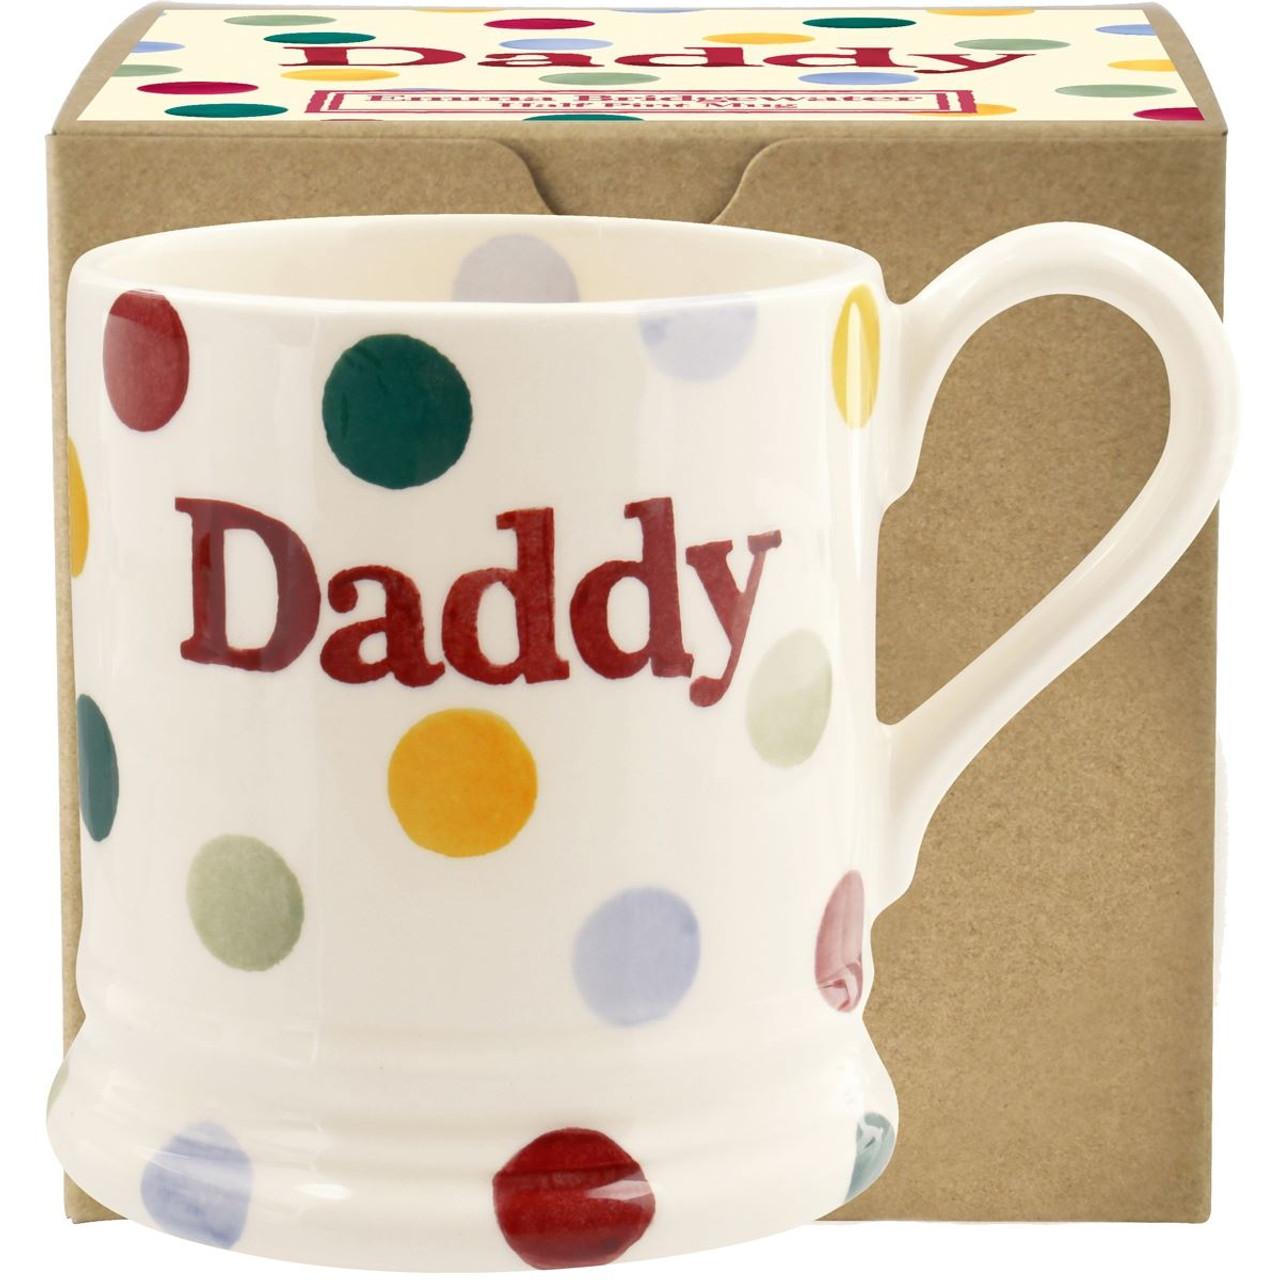 Emma Bridgewater Polka Dot Daddy Half Pint Mug